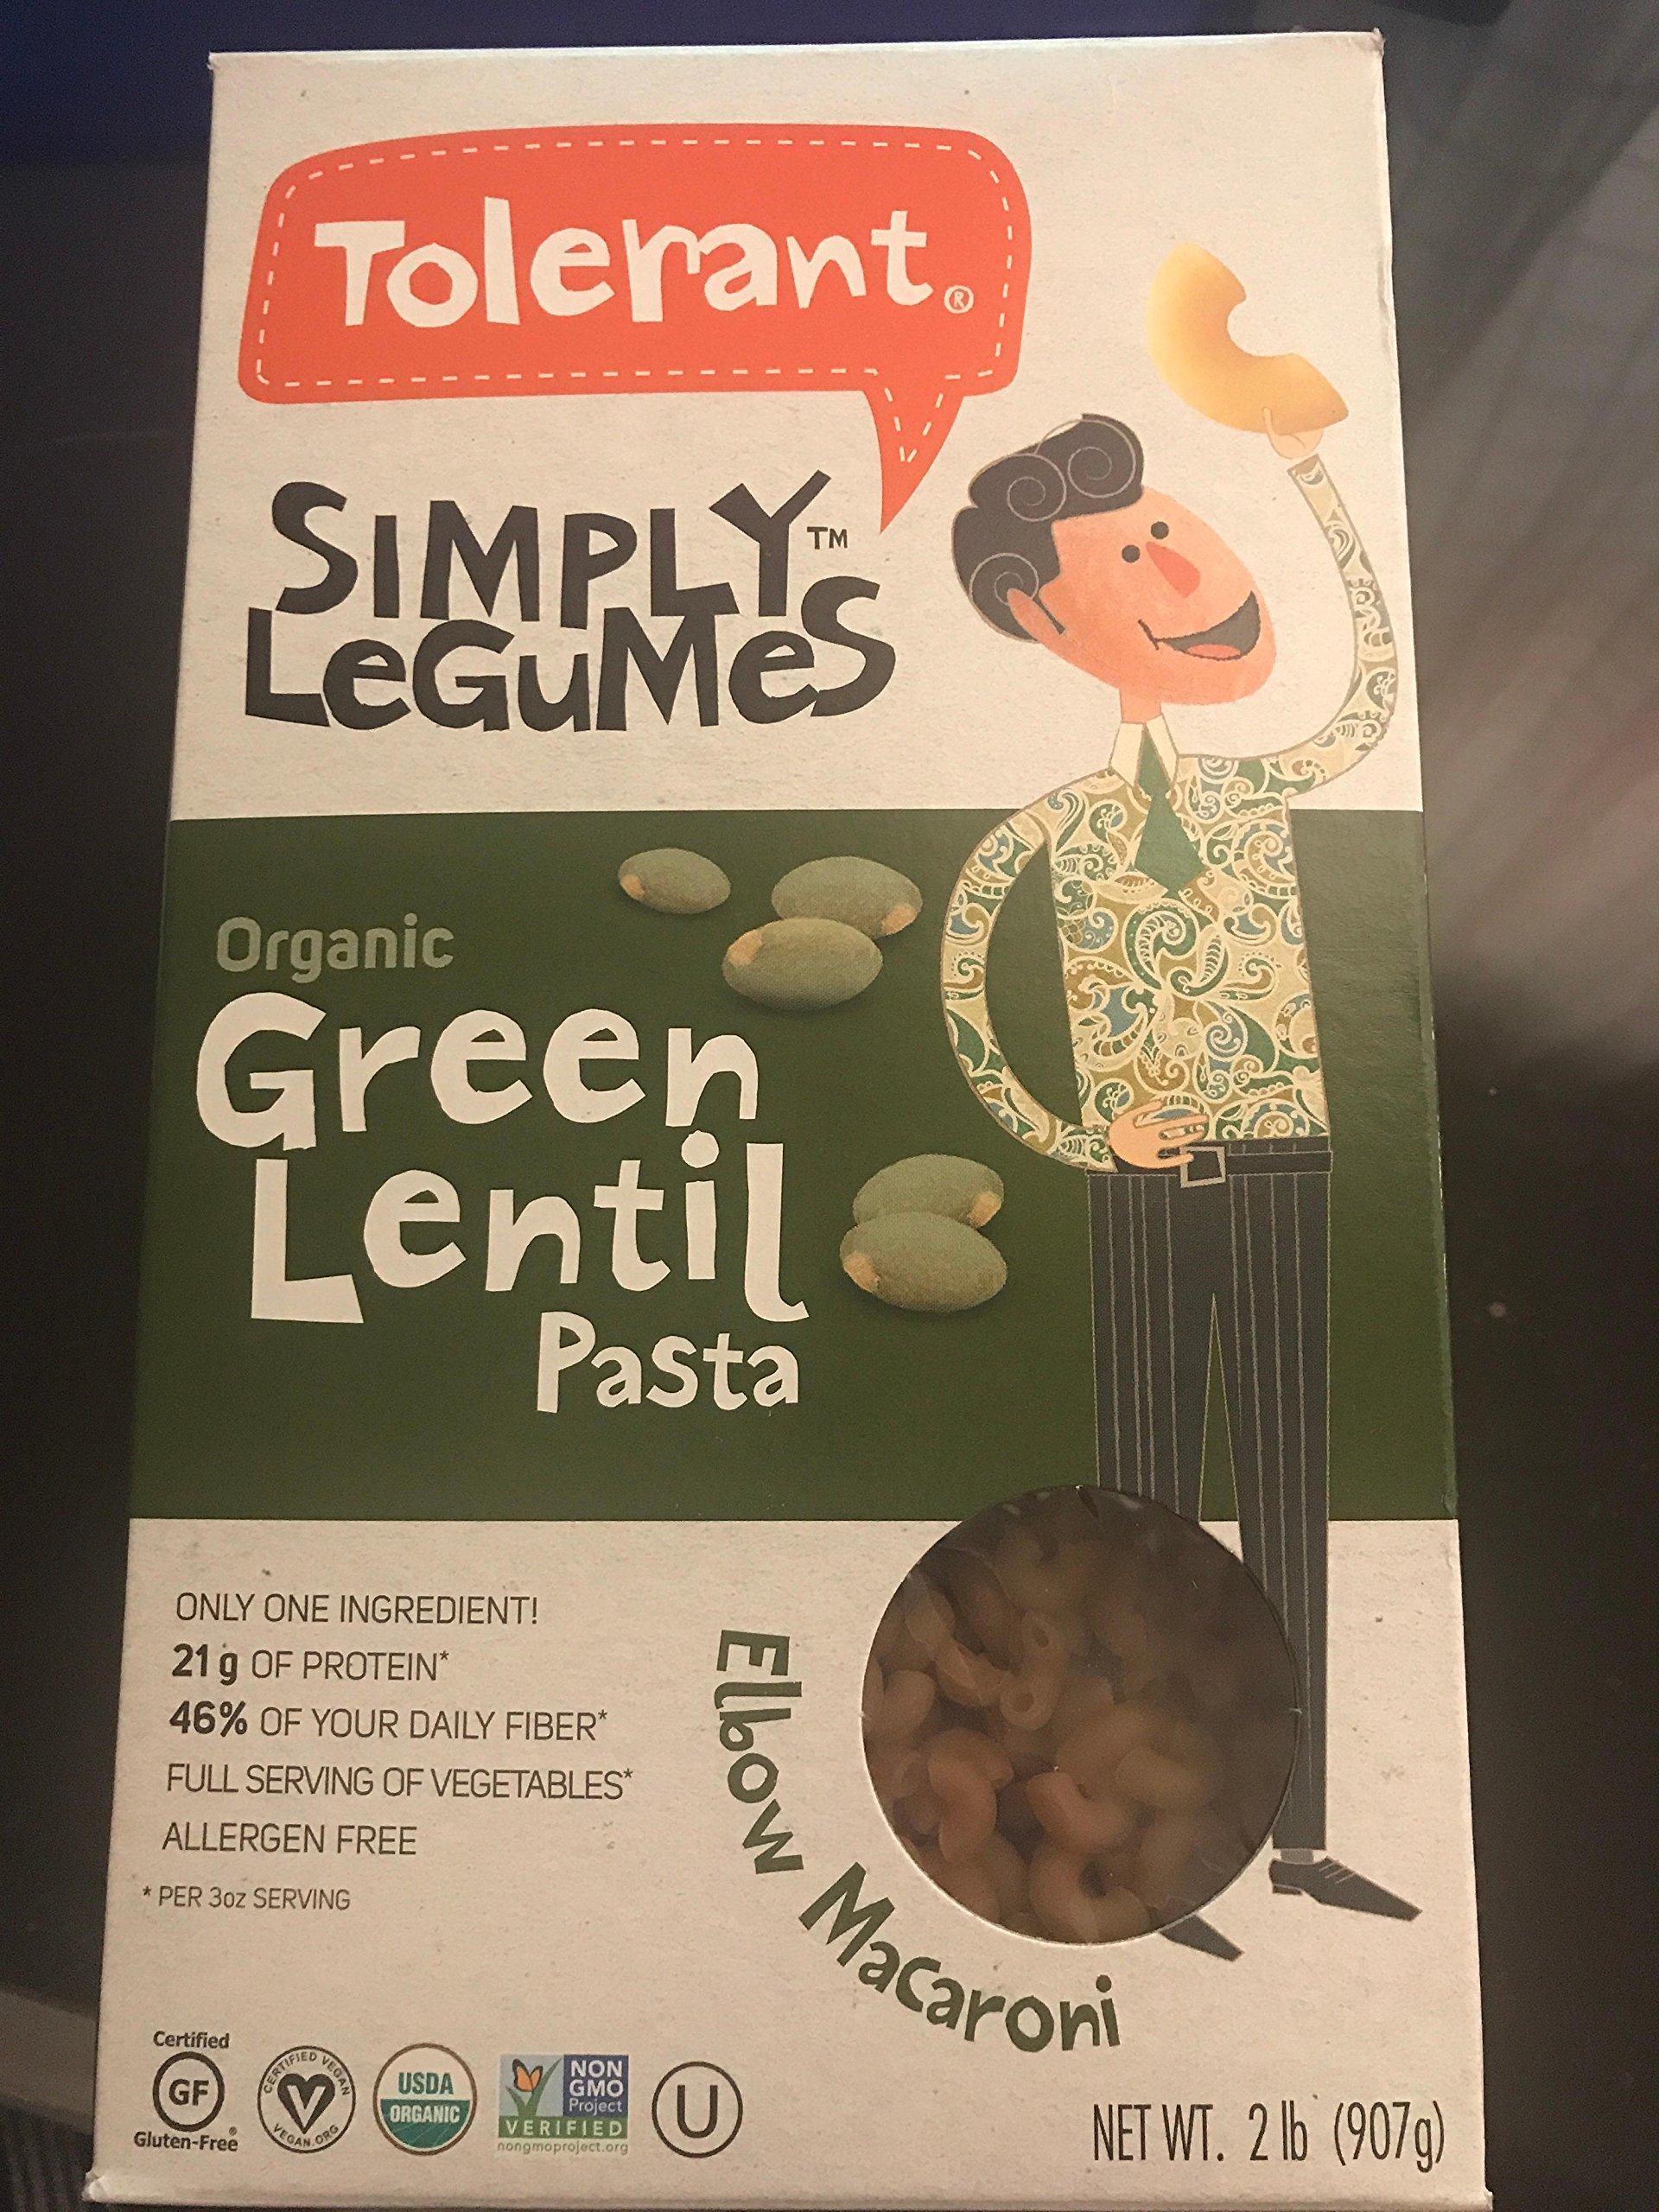 Tolerant simply legumes organic green lentil pasta 2 lb. ( 907g) by Tolerant simply legumes